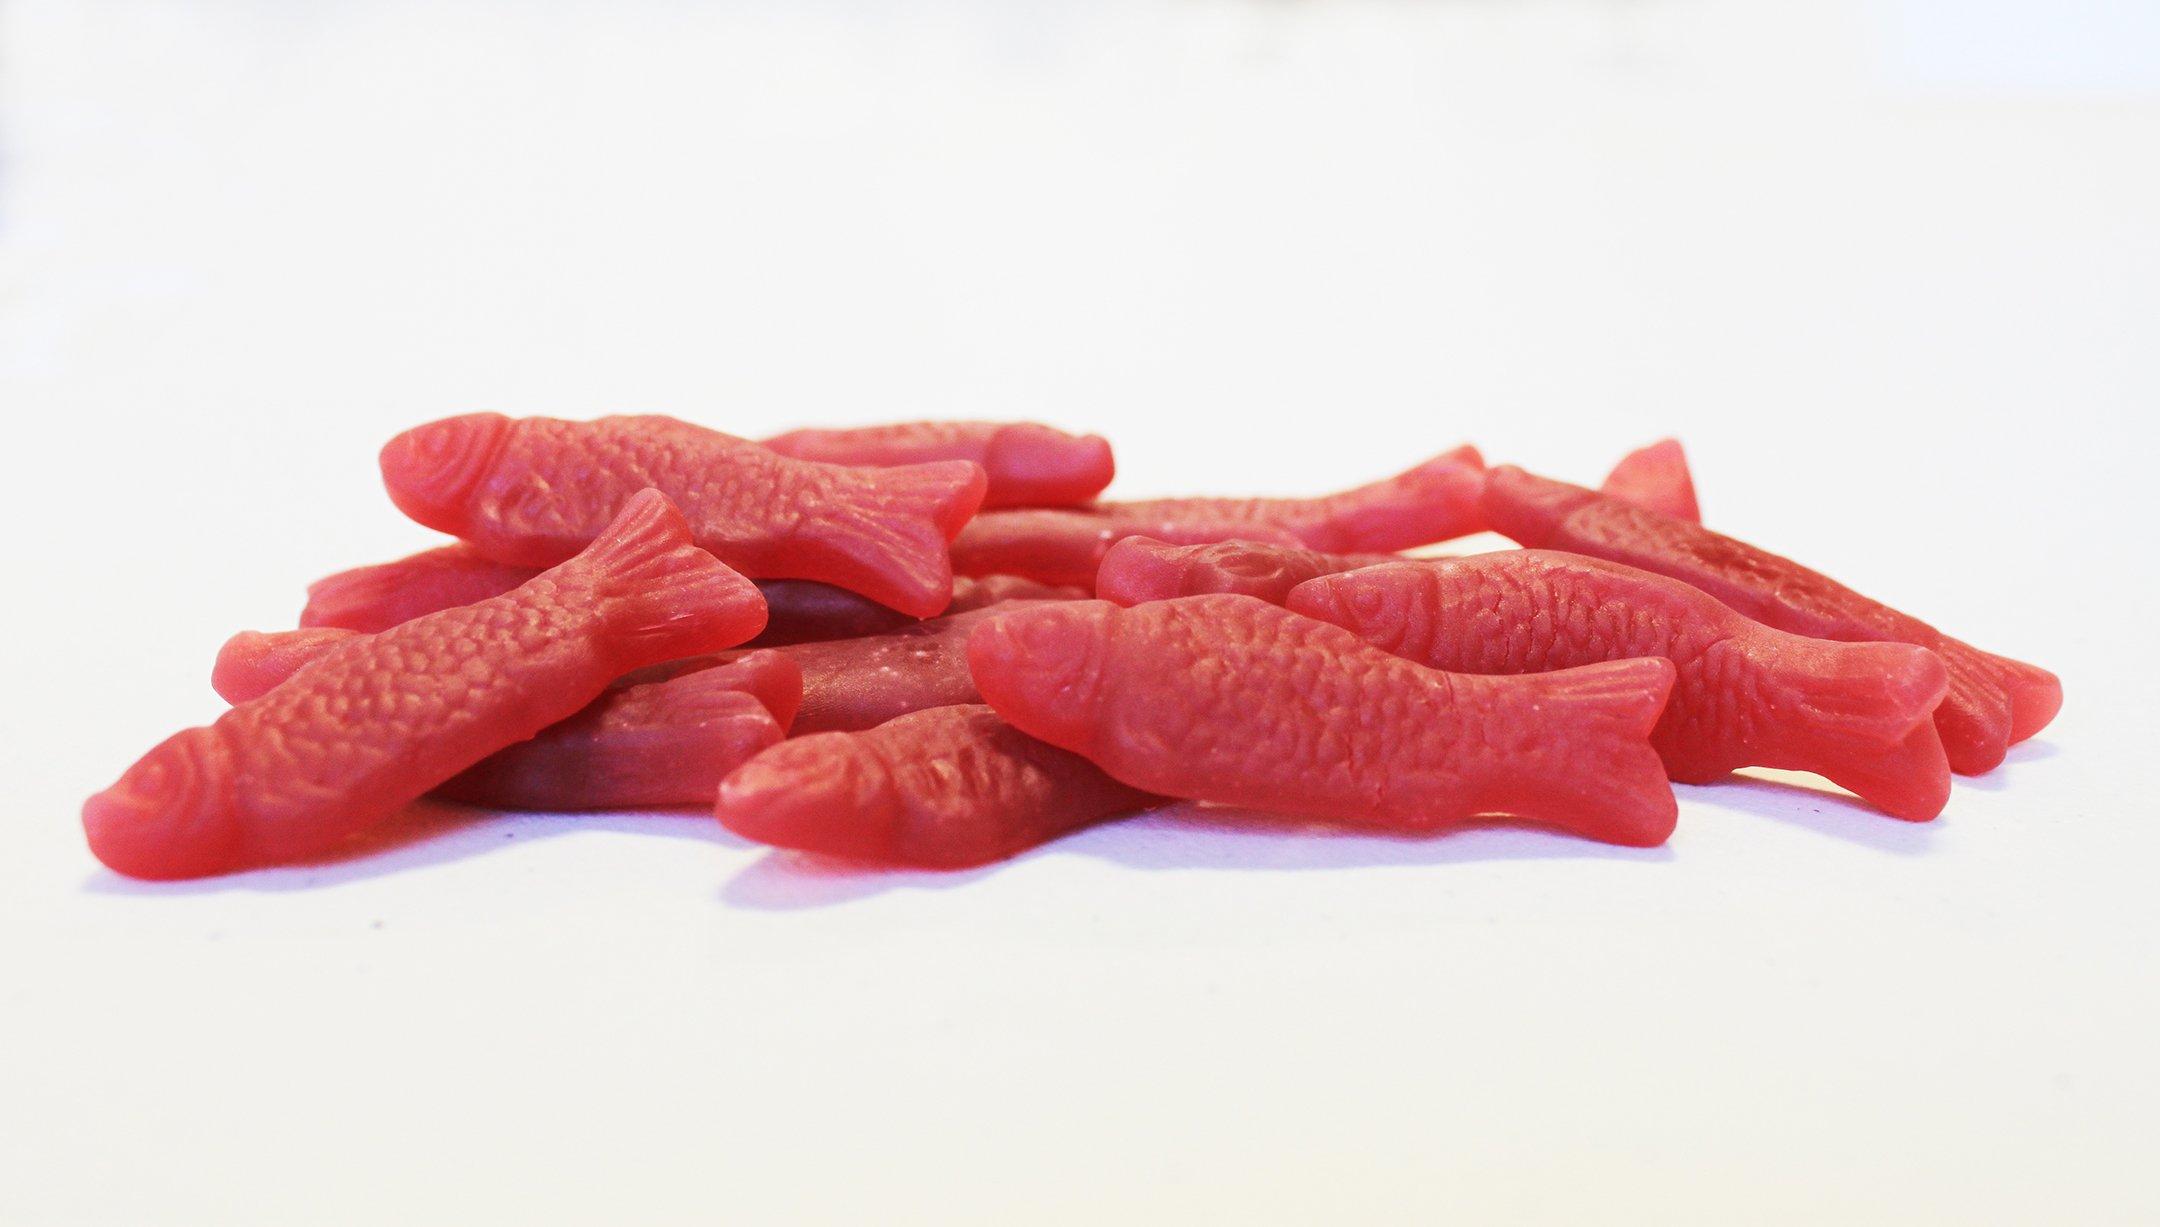 Wholesome Organic DelishFish, 10 Pound Bulk by WHOLESOME! (Image #4)